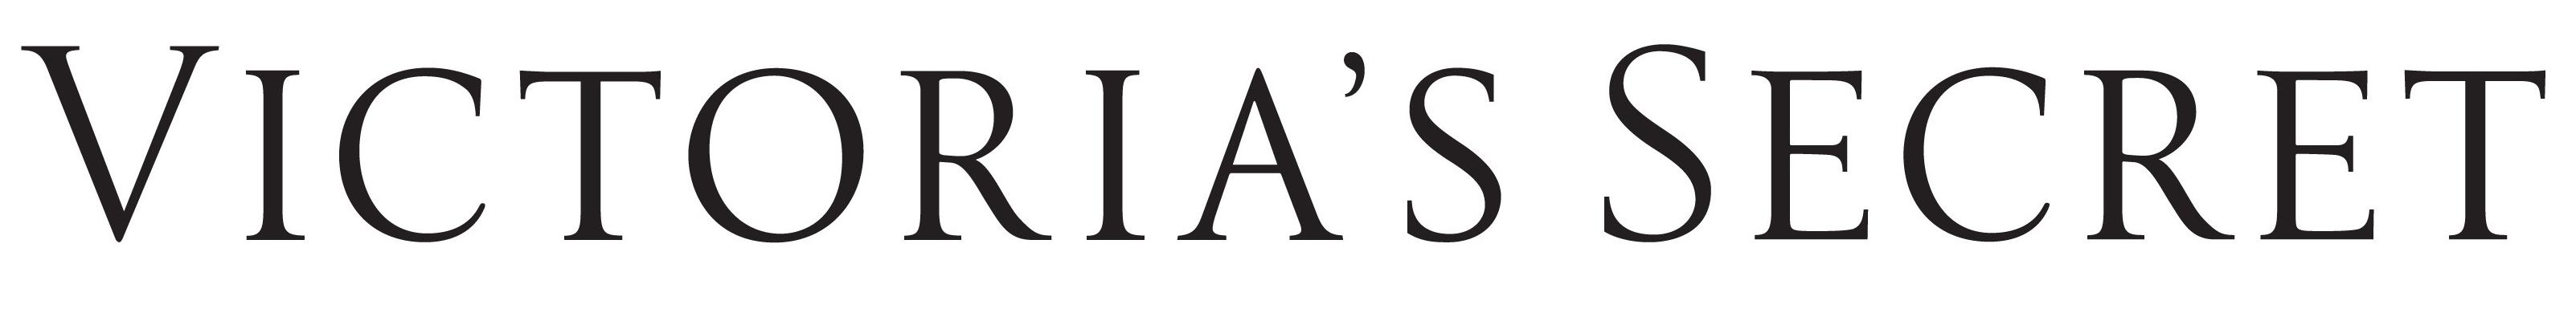 Victorias Secret Current Logo